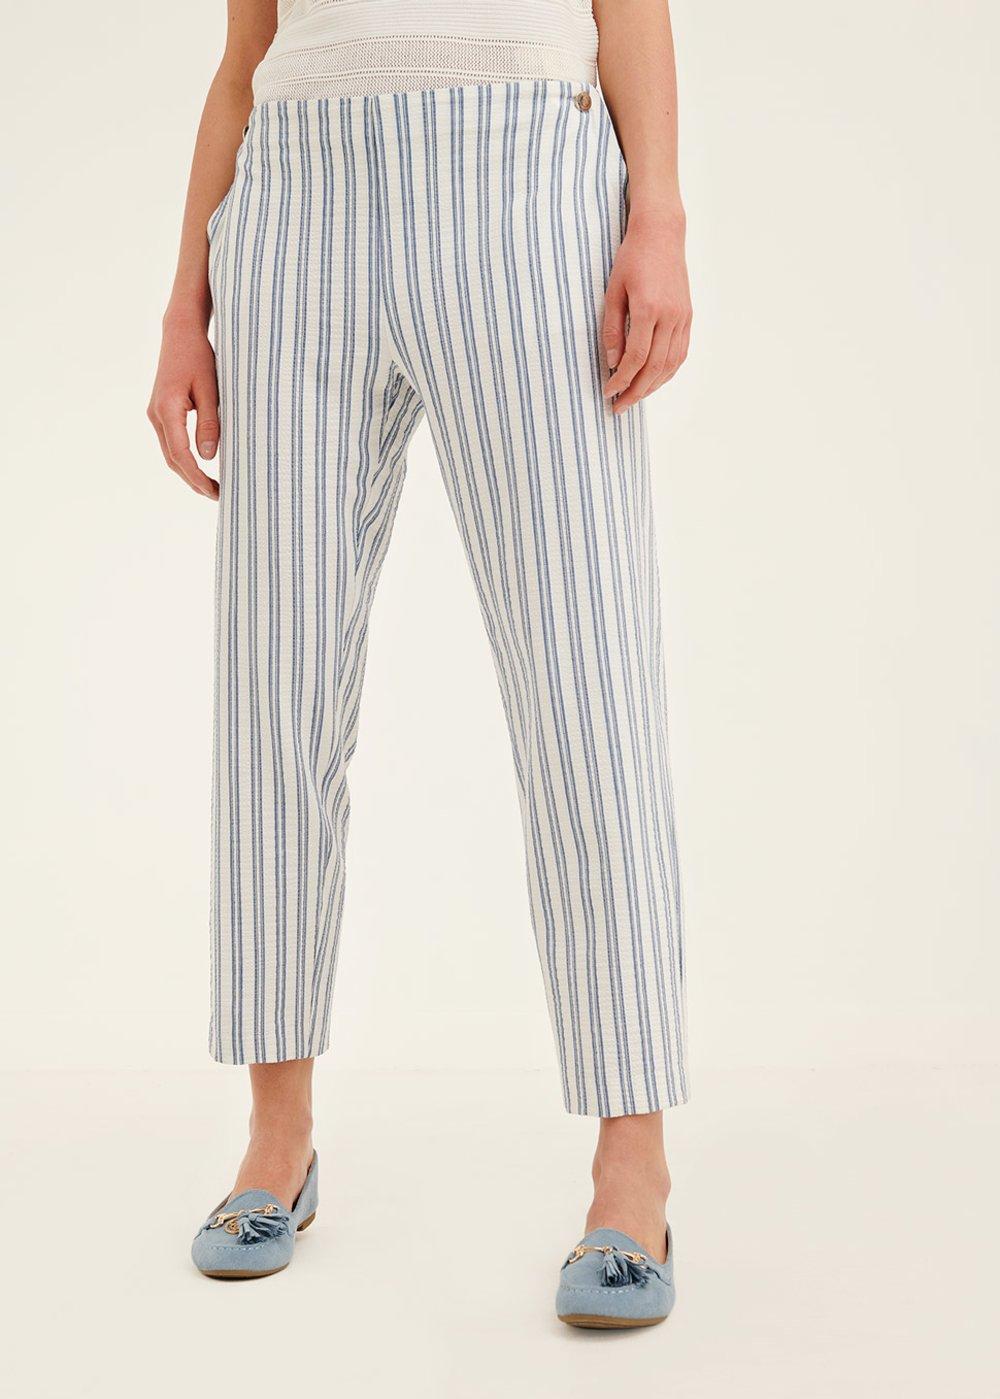 Pantalone Cara a righe veriticali - Blue / White Stripes - Donna